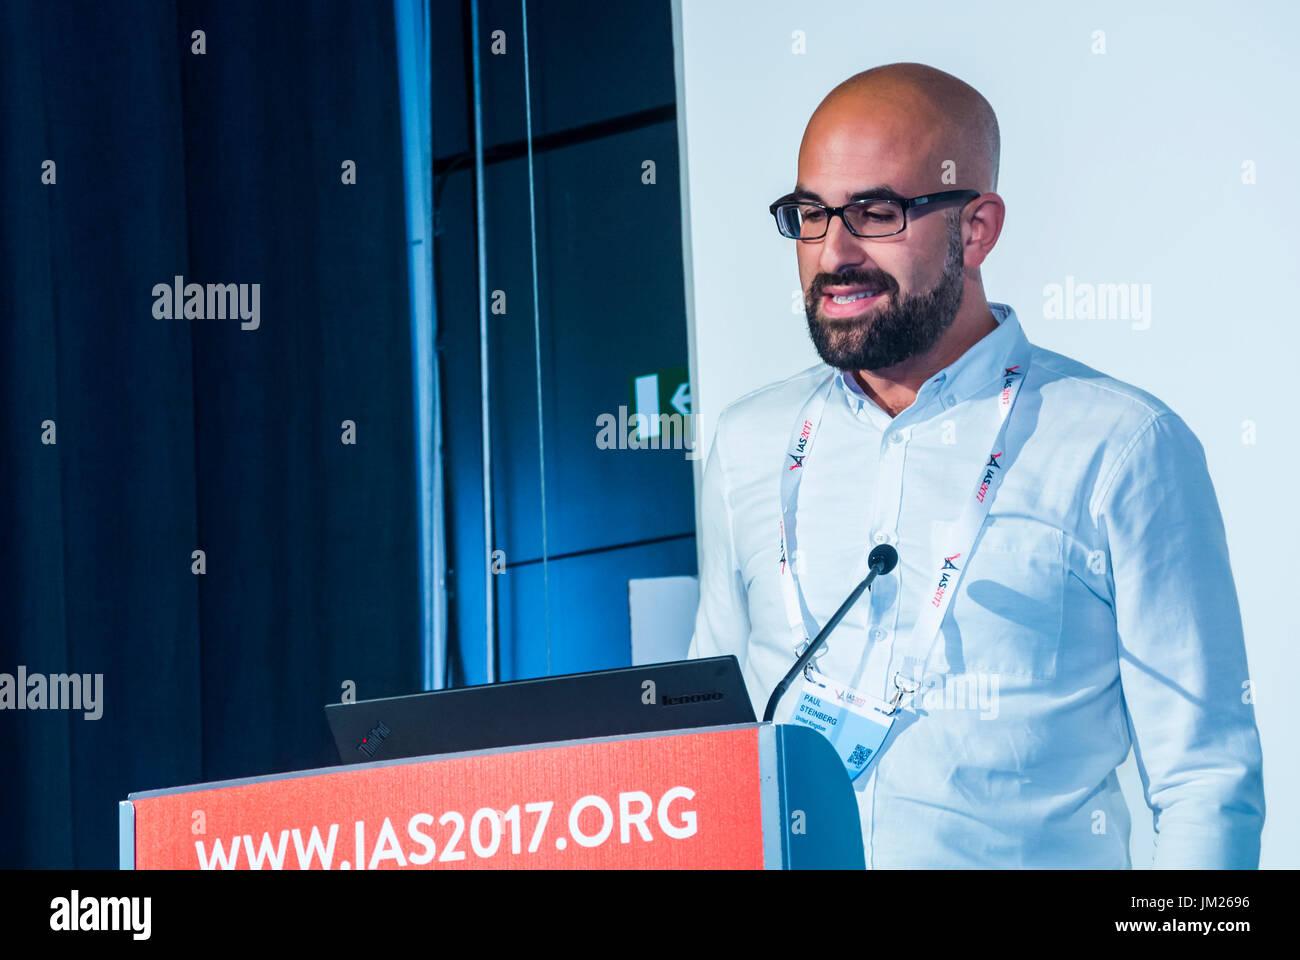 Paris, France. I.A.S. International AIDS Society Congress, Paul Steinberg, London HIV Prevention program, speaking - Stock Image